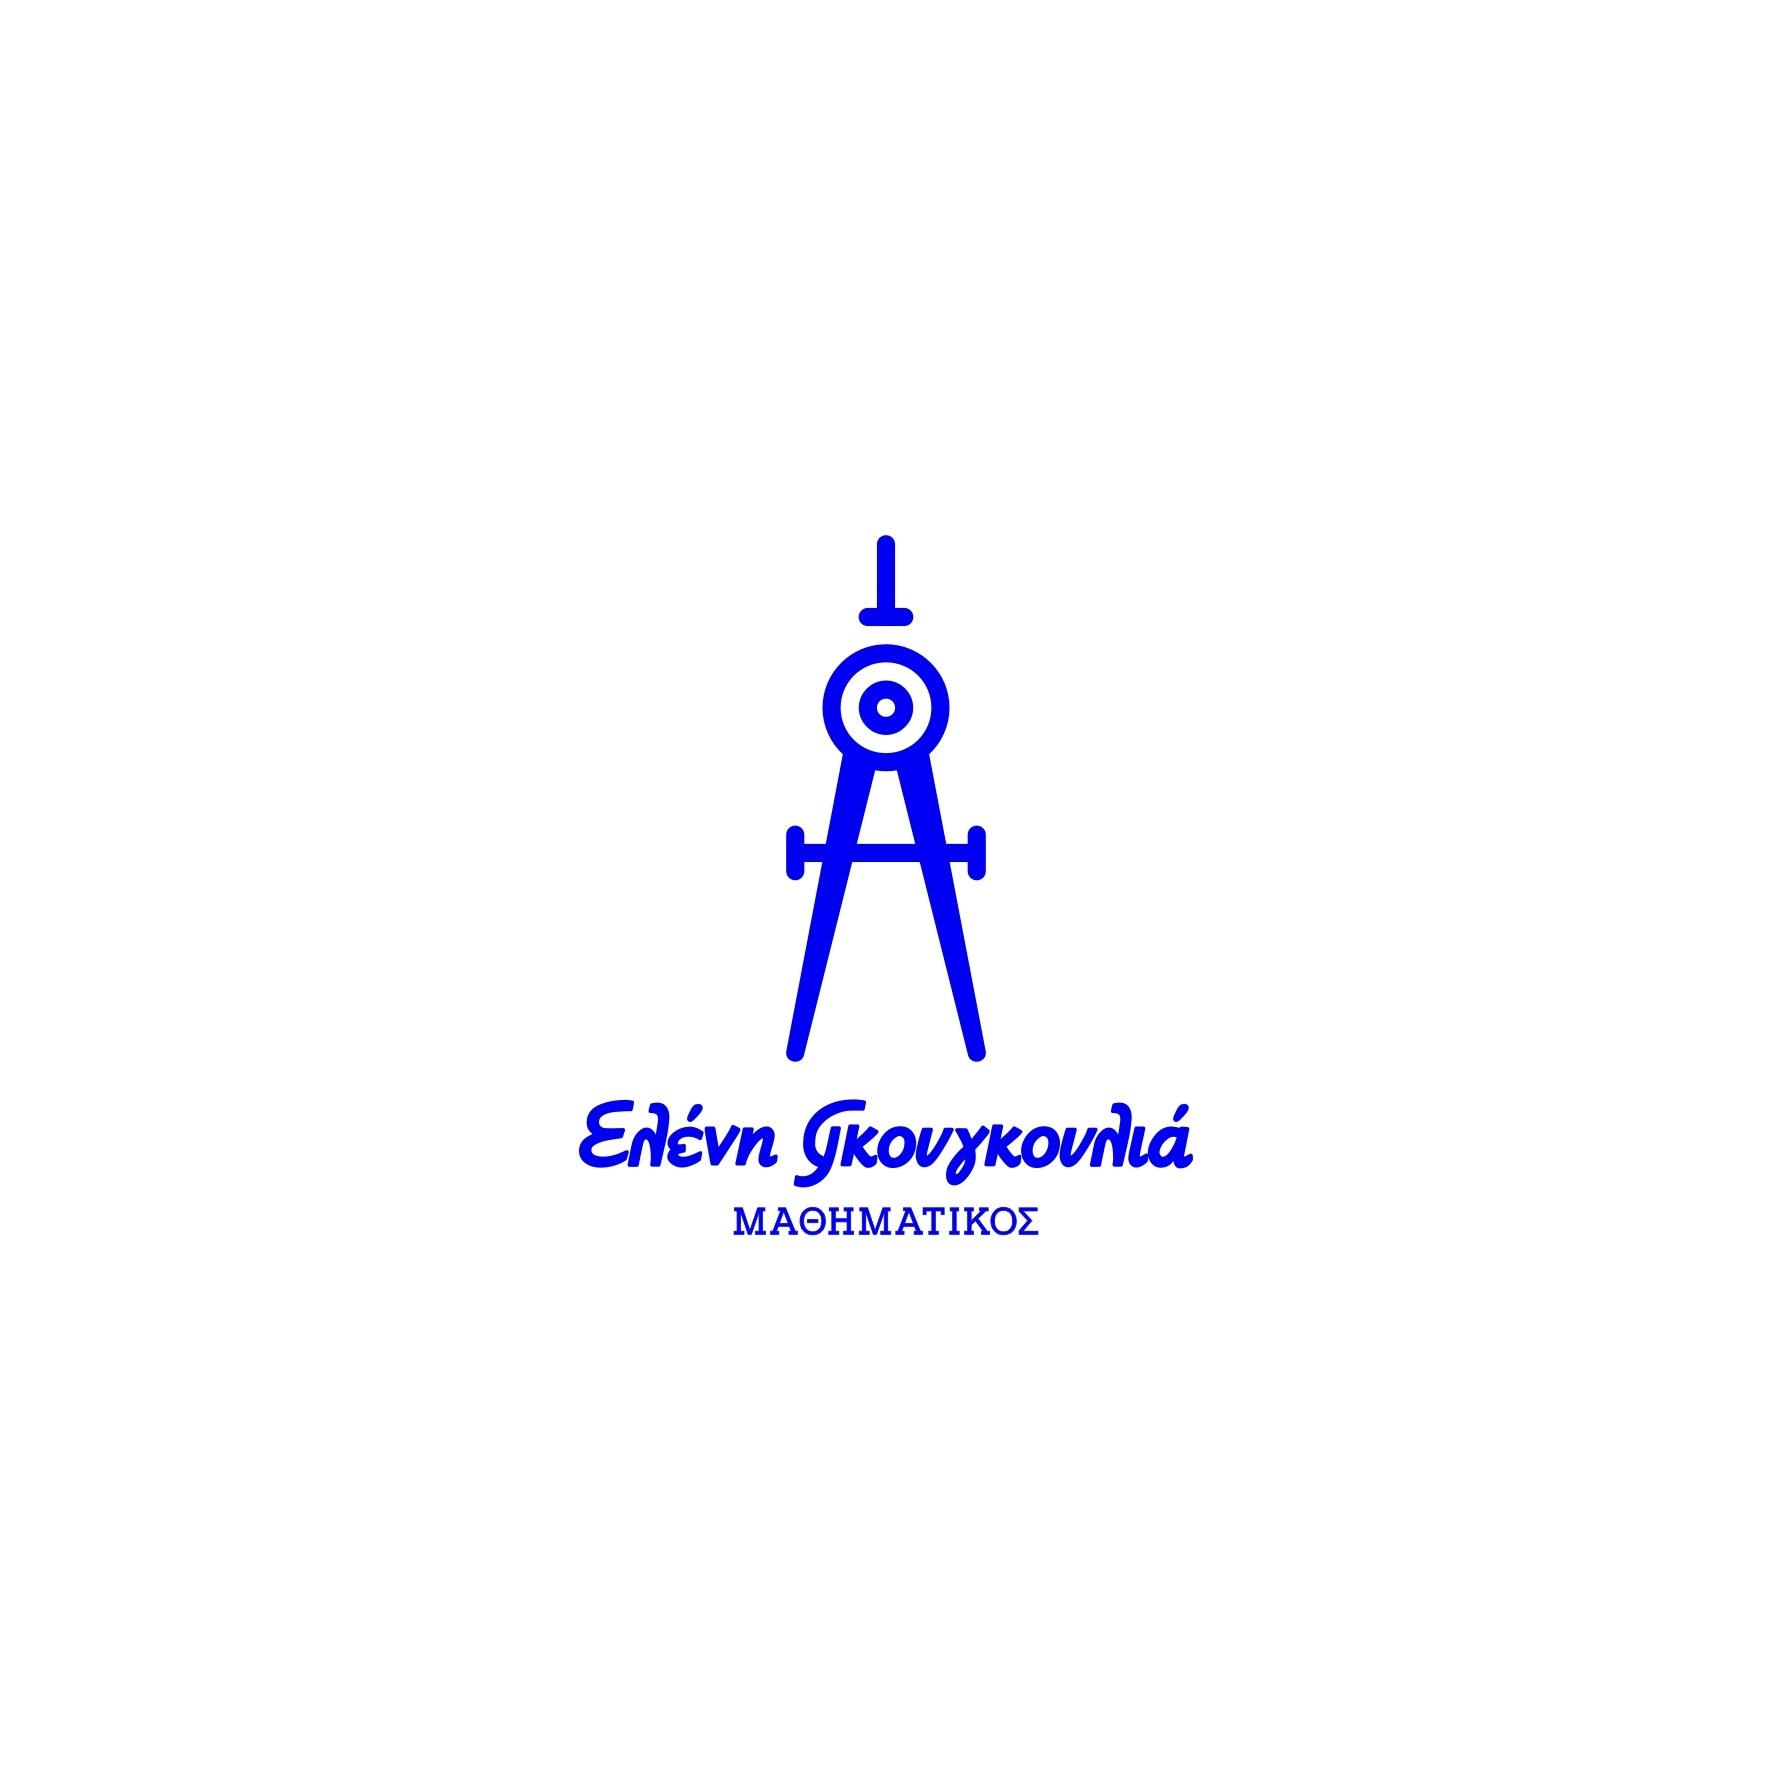 https://0501.nccdn.net/4_2/000/000/07d/95b/eleni_gougoulia_by_koukida-1771x1771.jpg